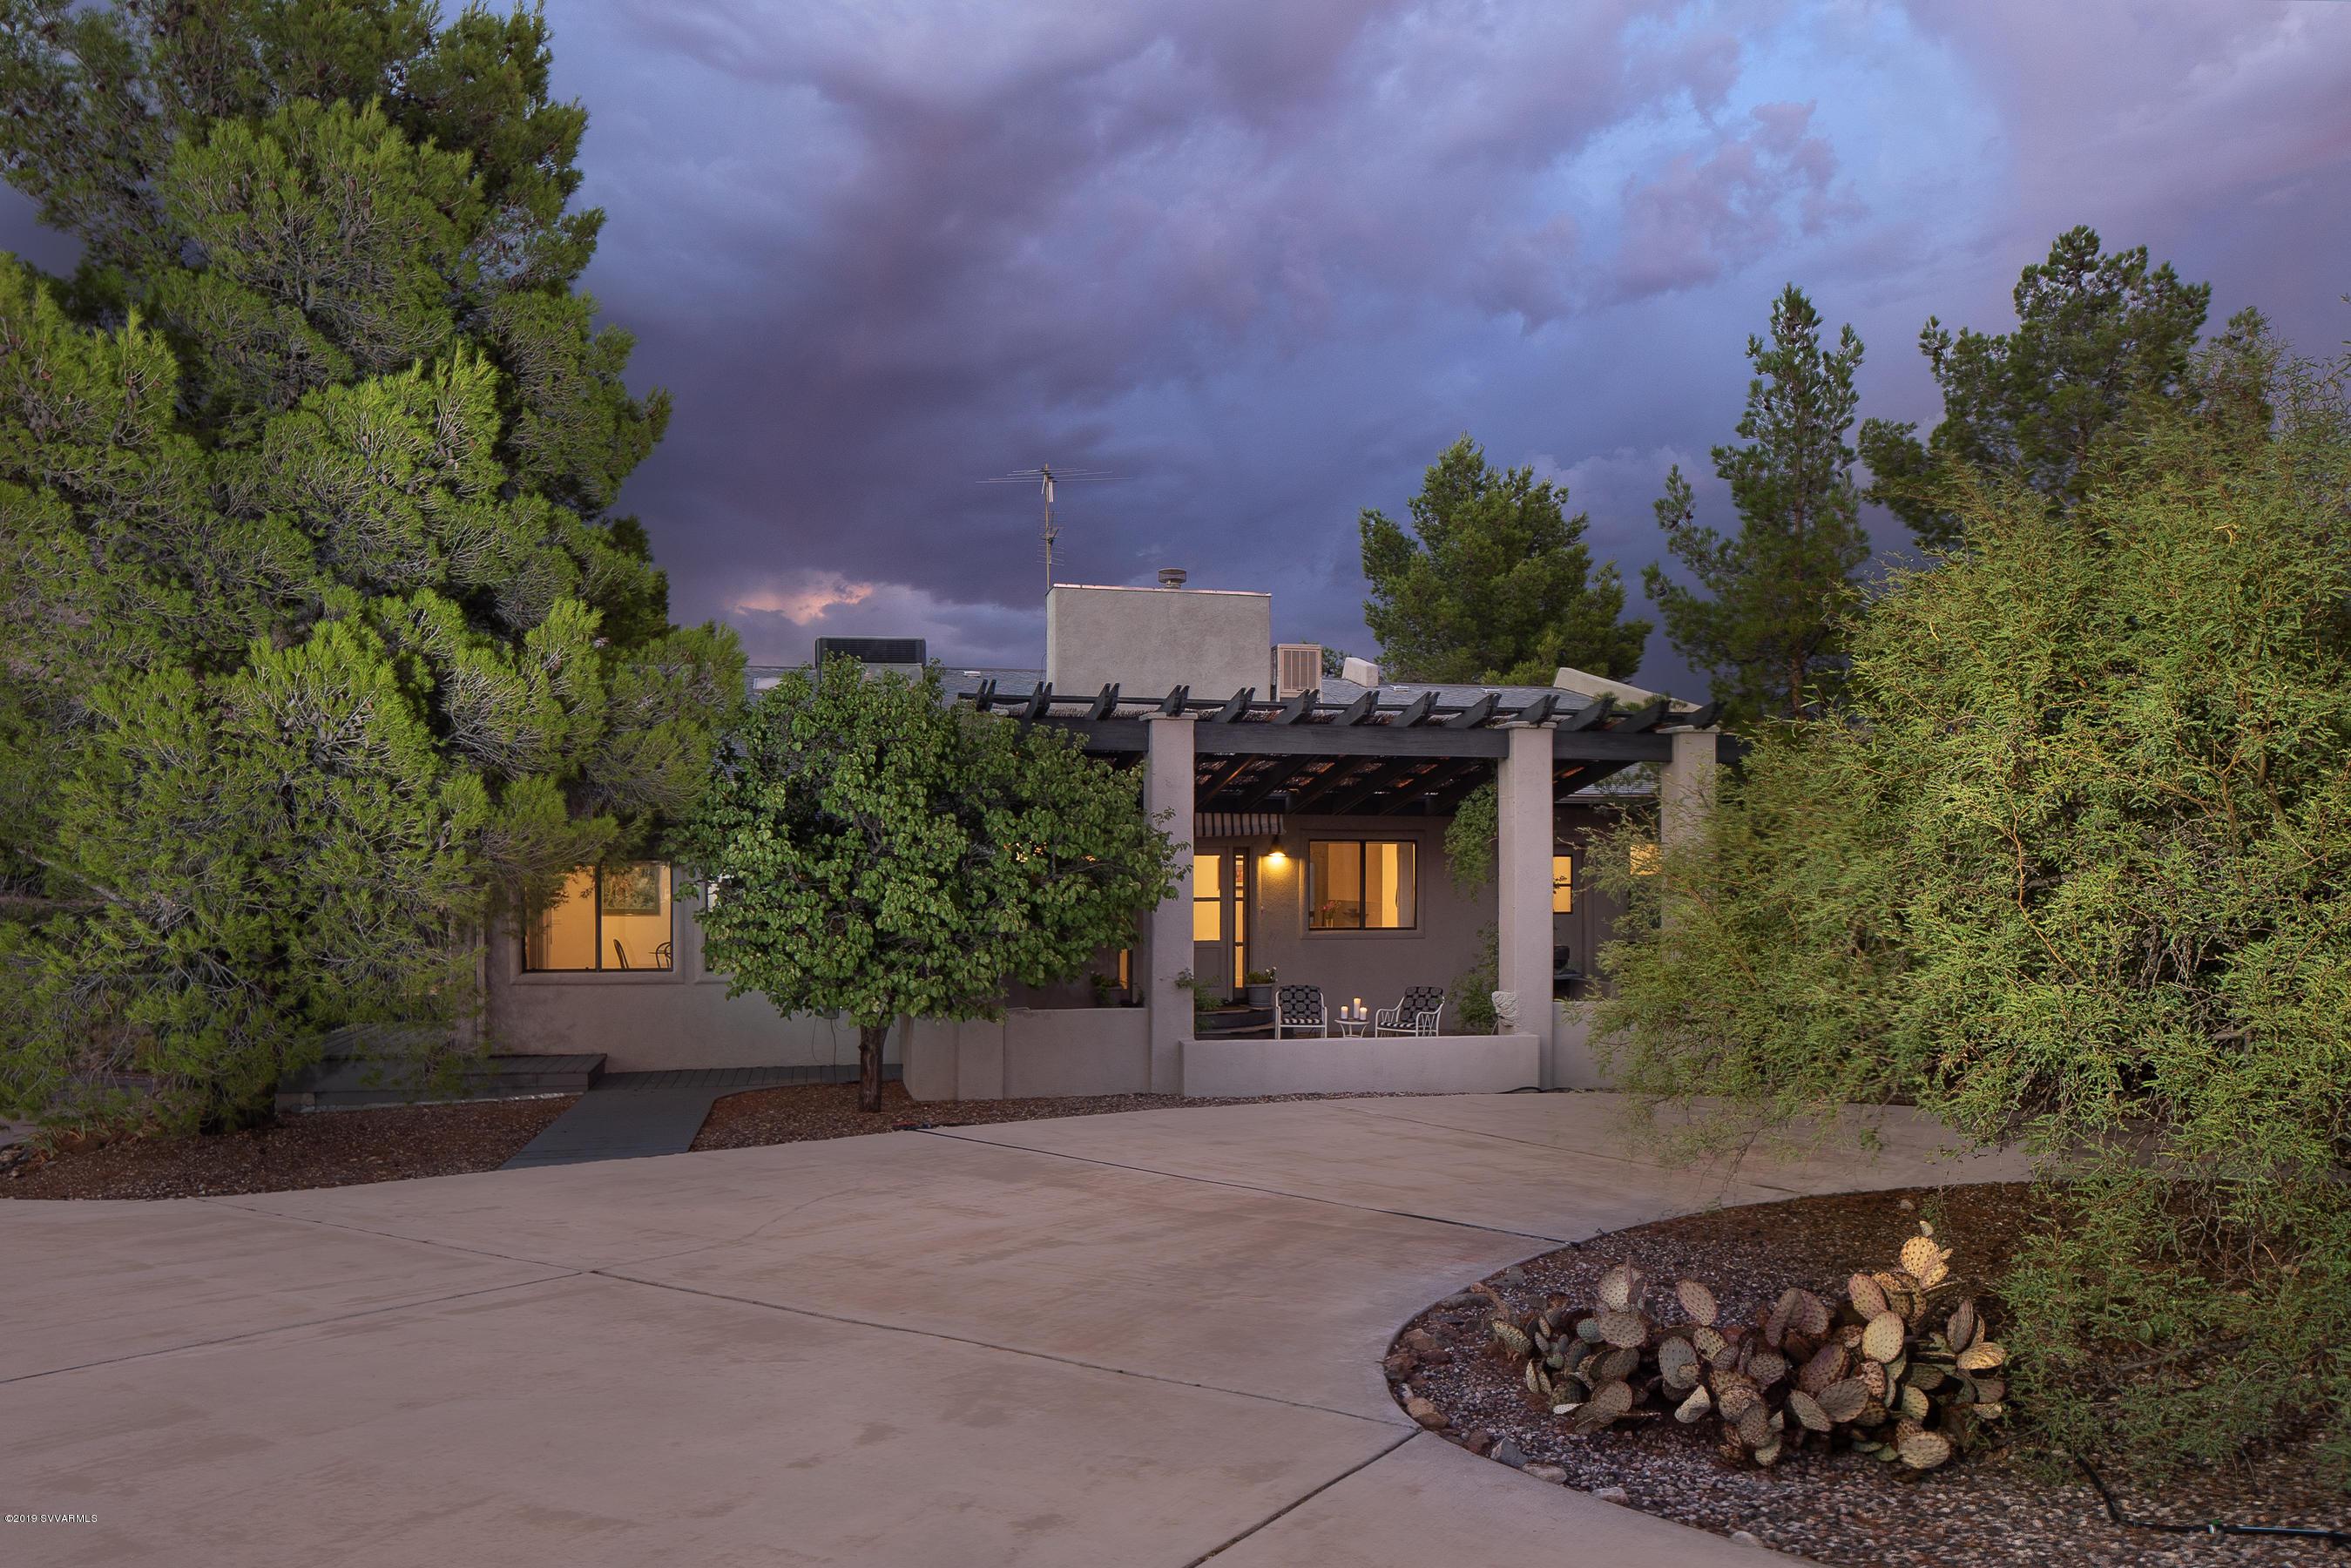 1090 Old Jerome Hwy Clarkdale, AZ 86324